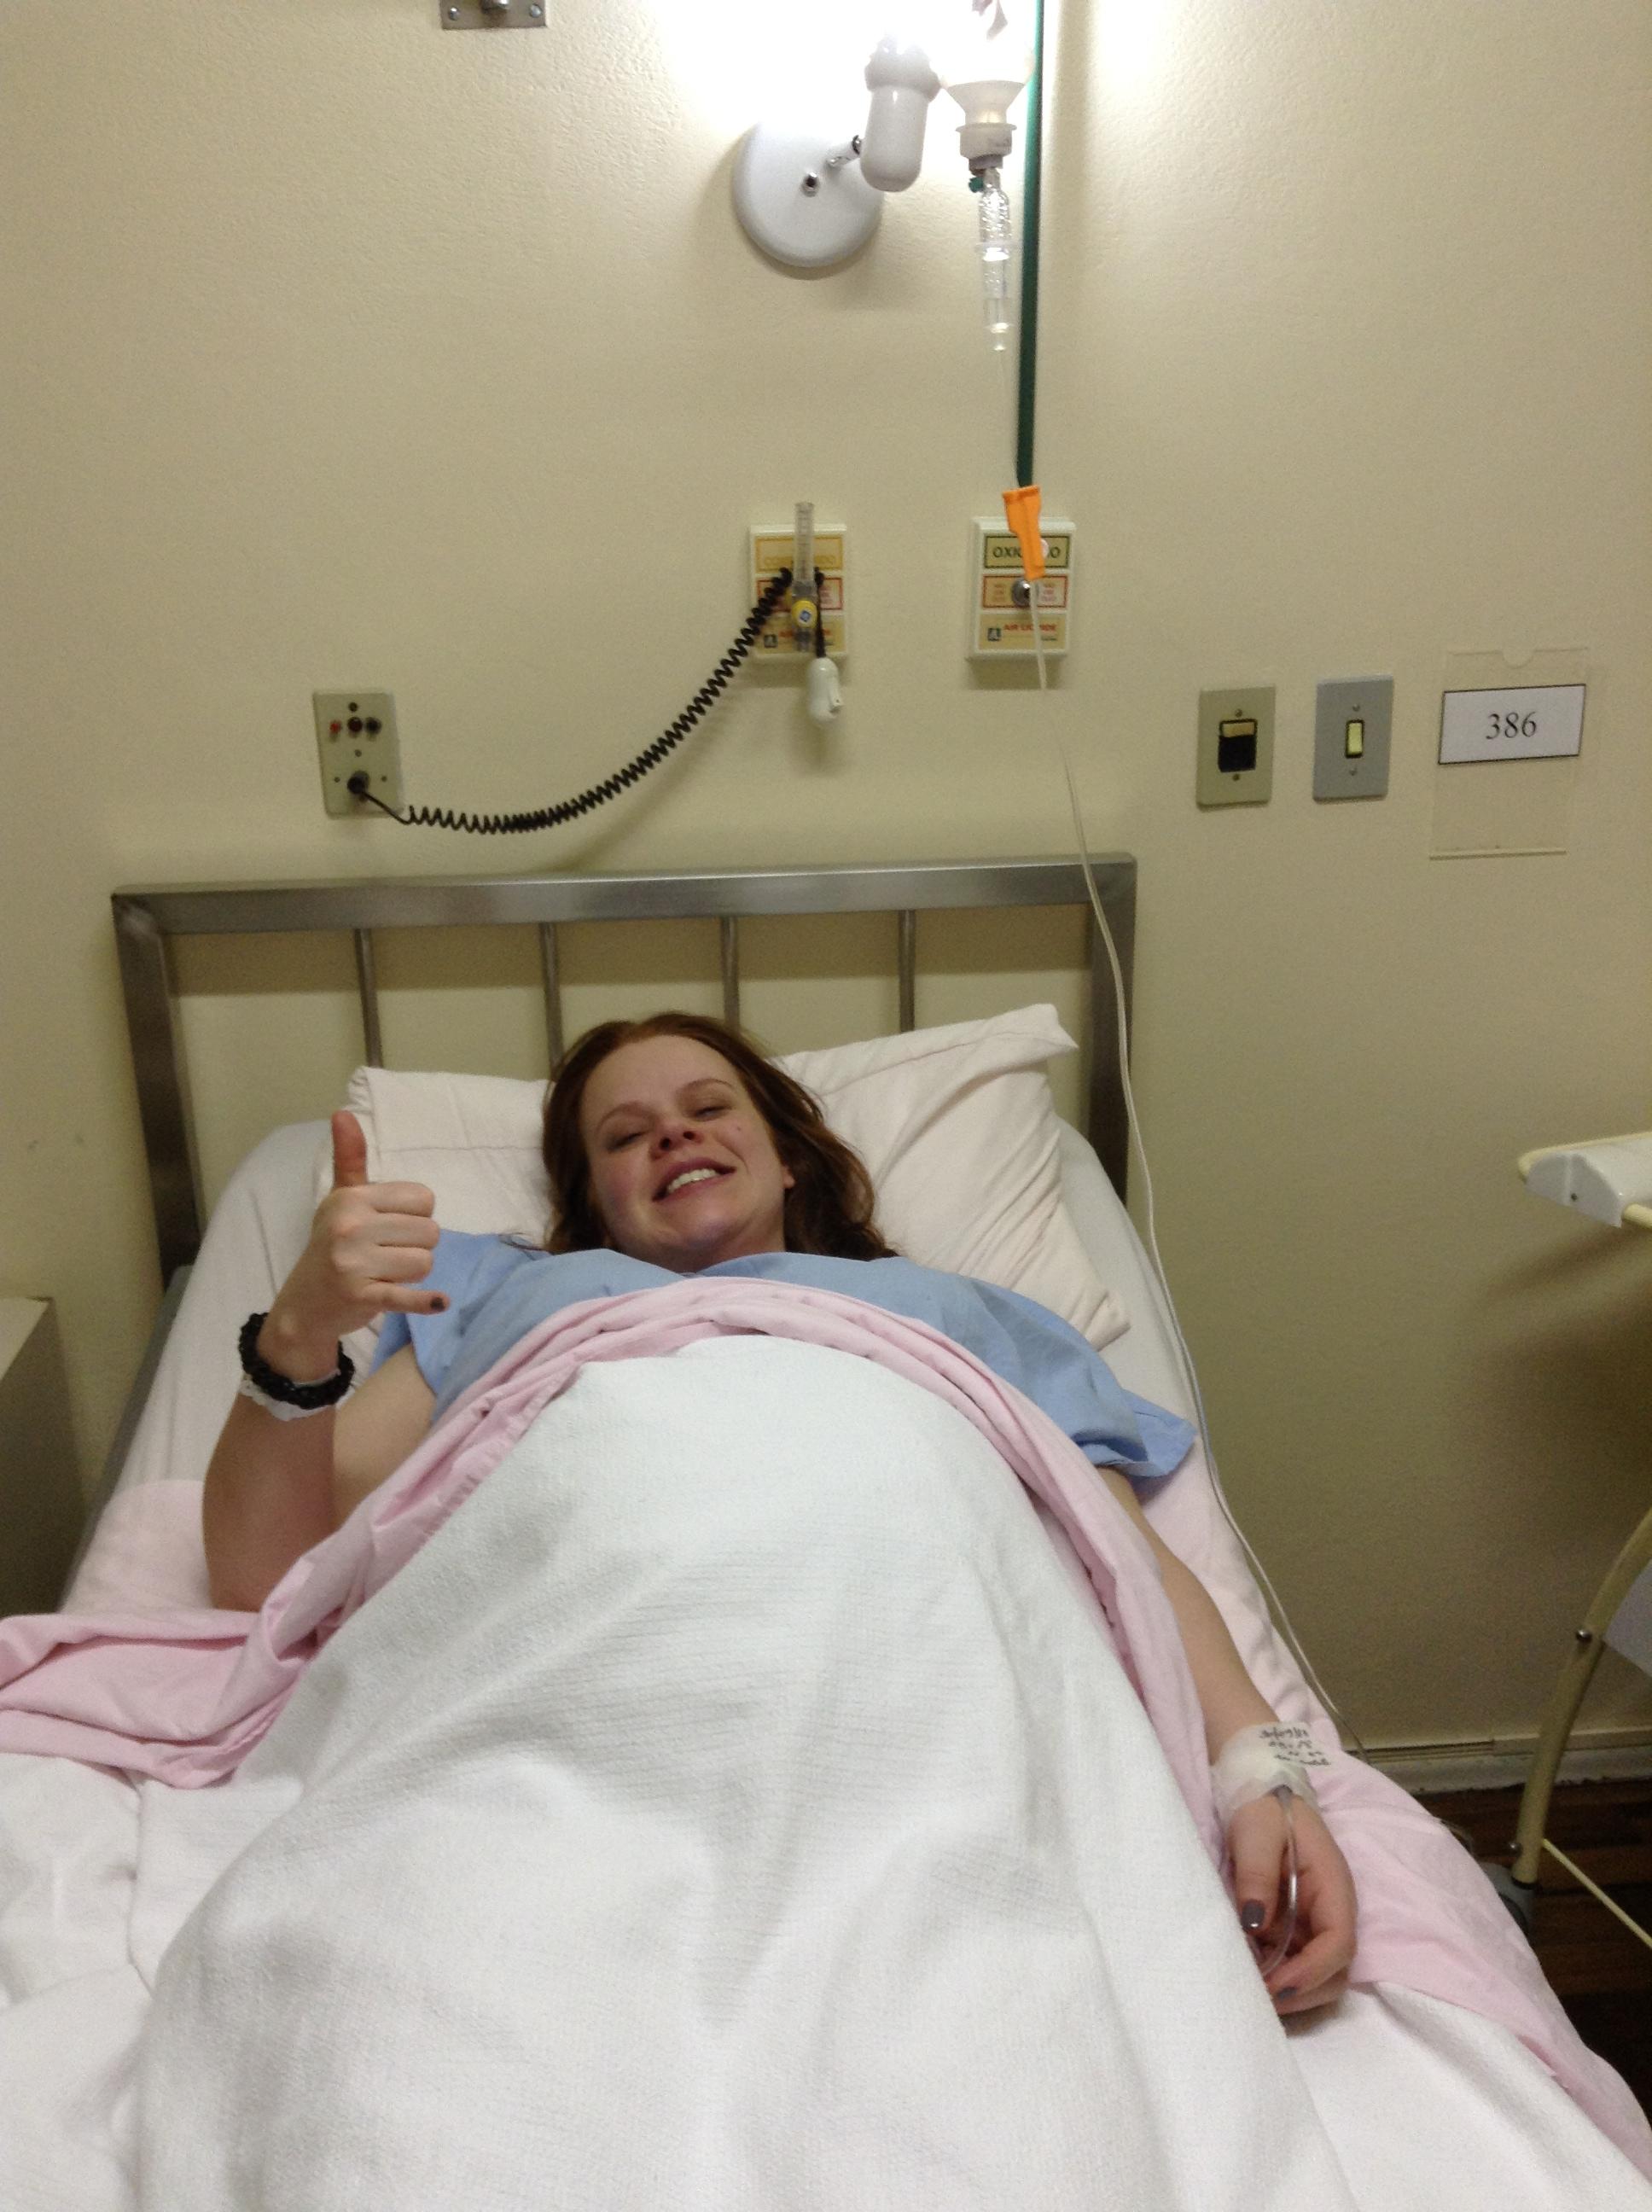 Hospital!